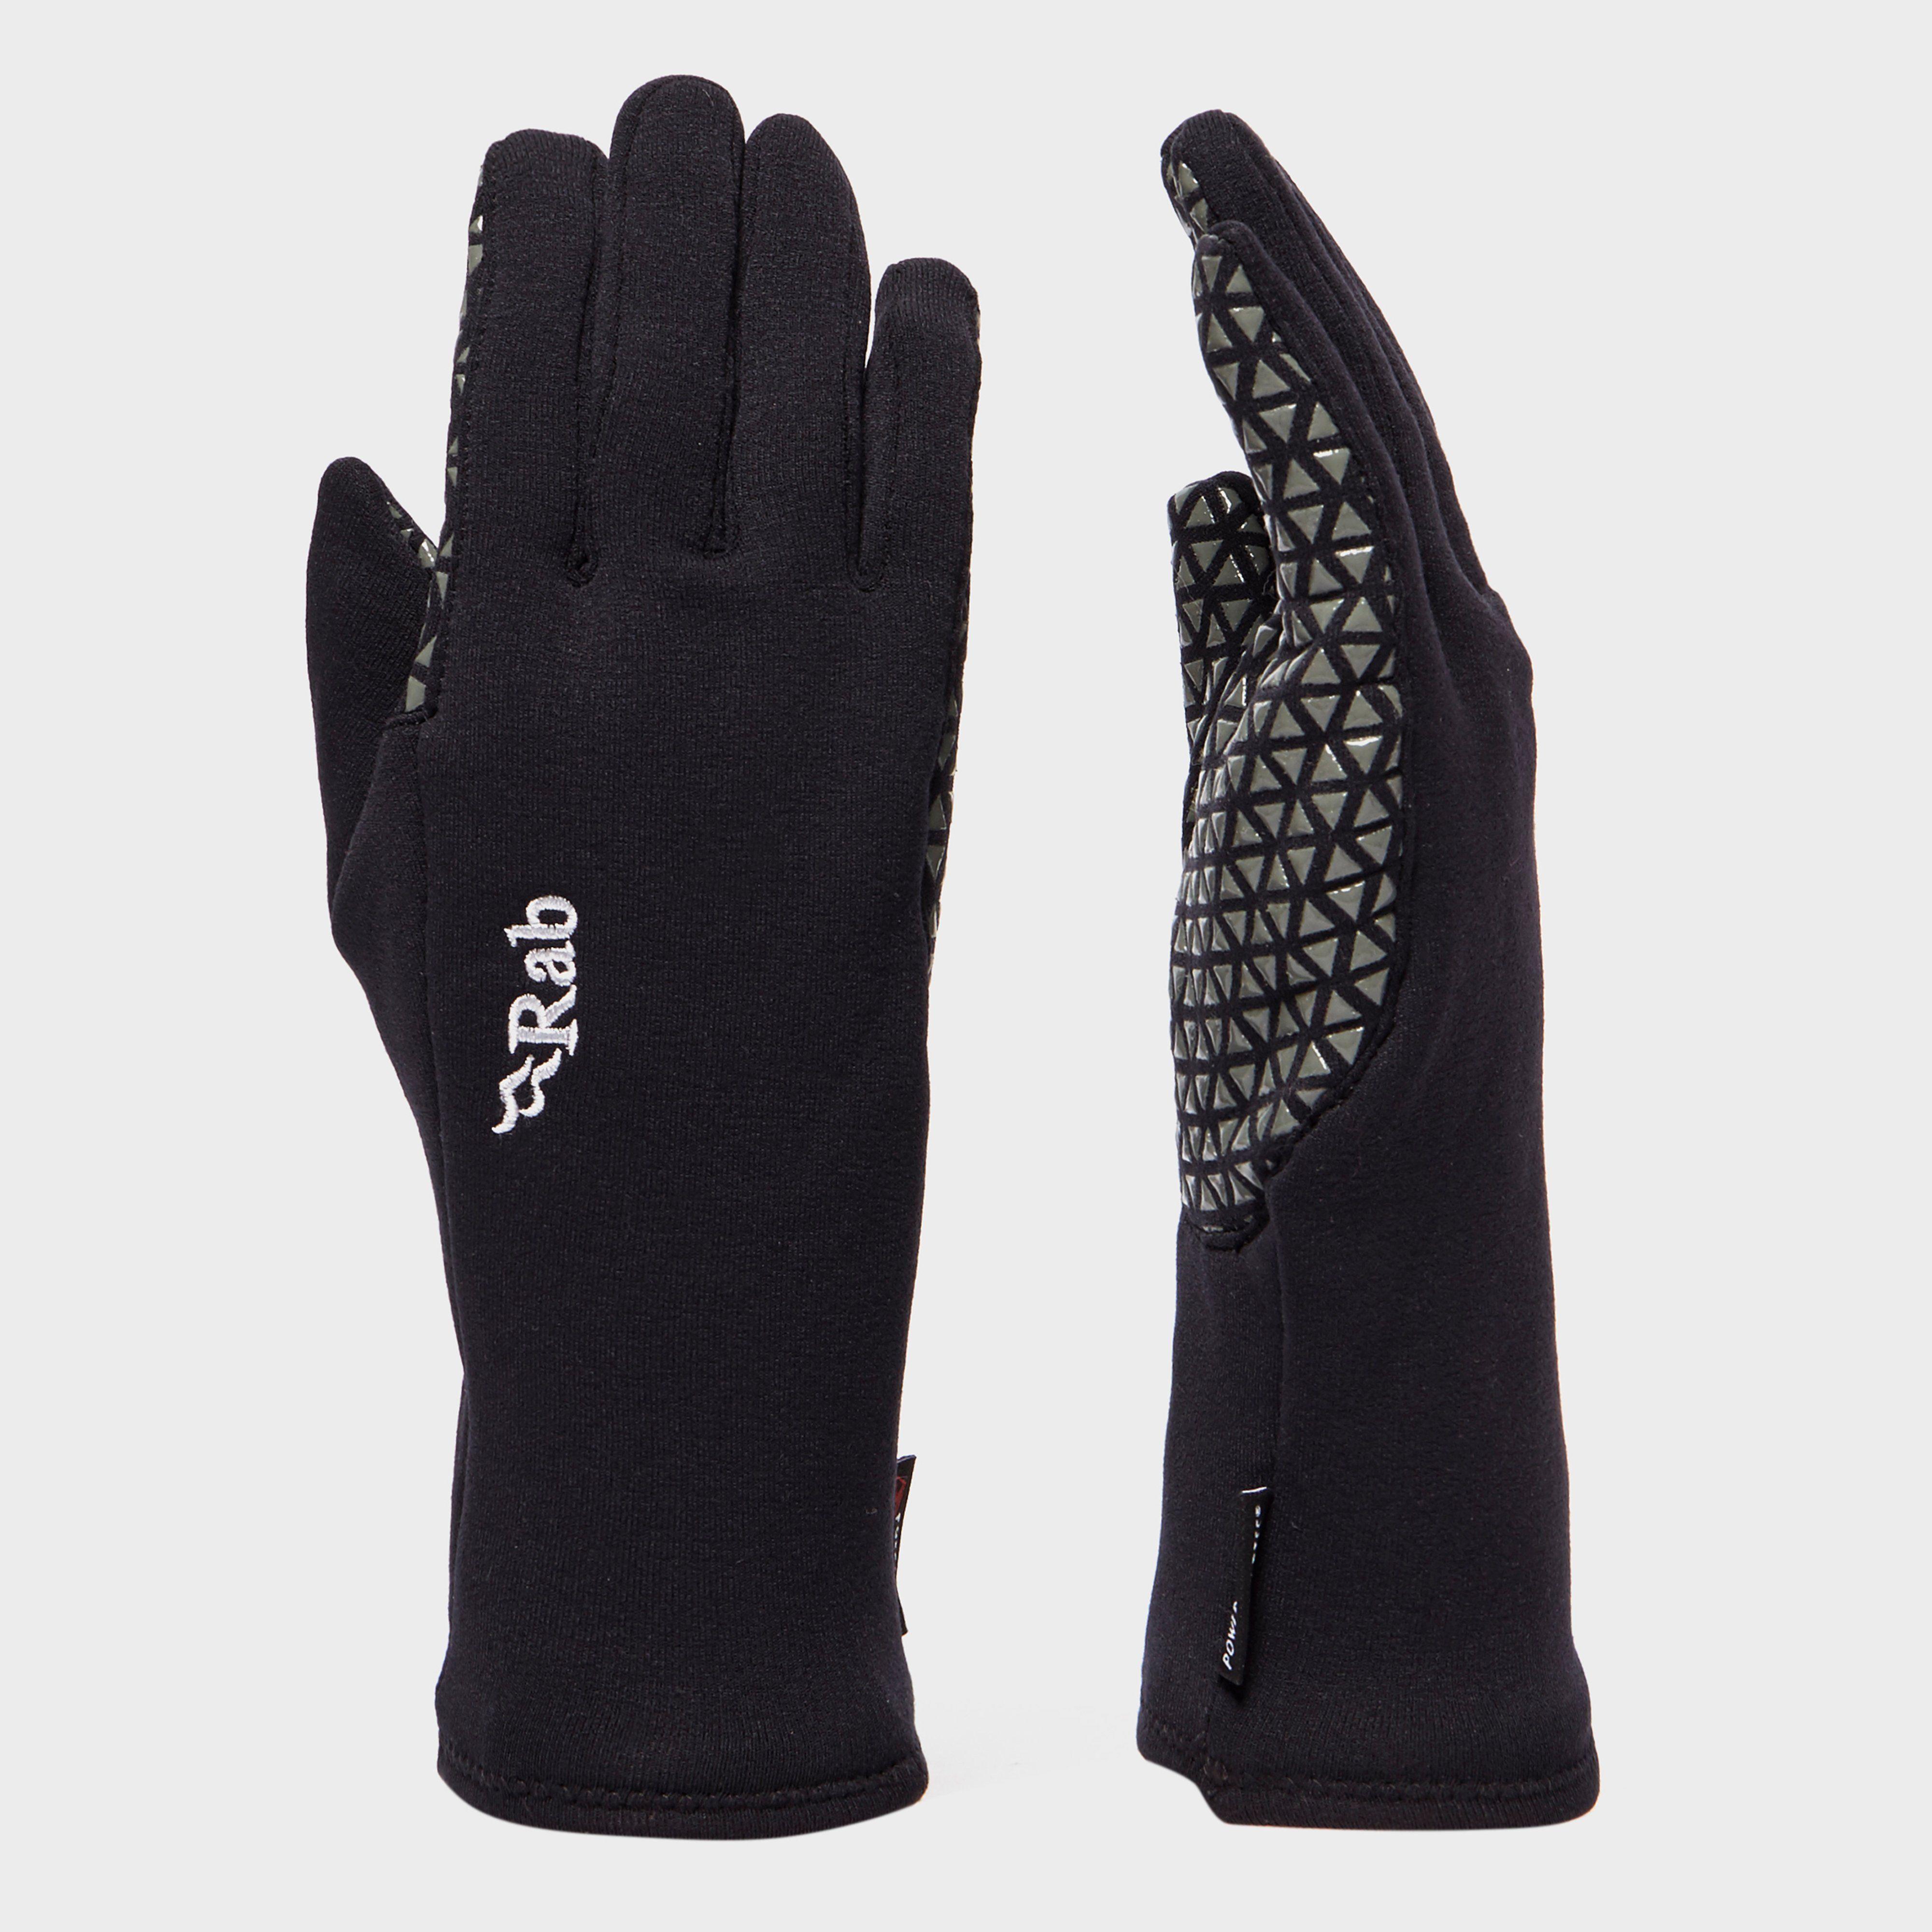 RAB Power Stretch Grip Glove